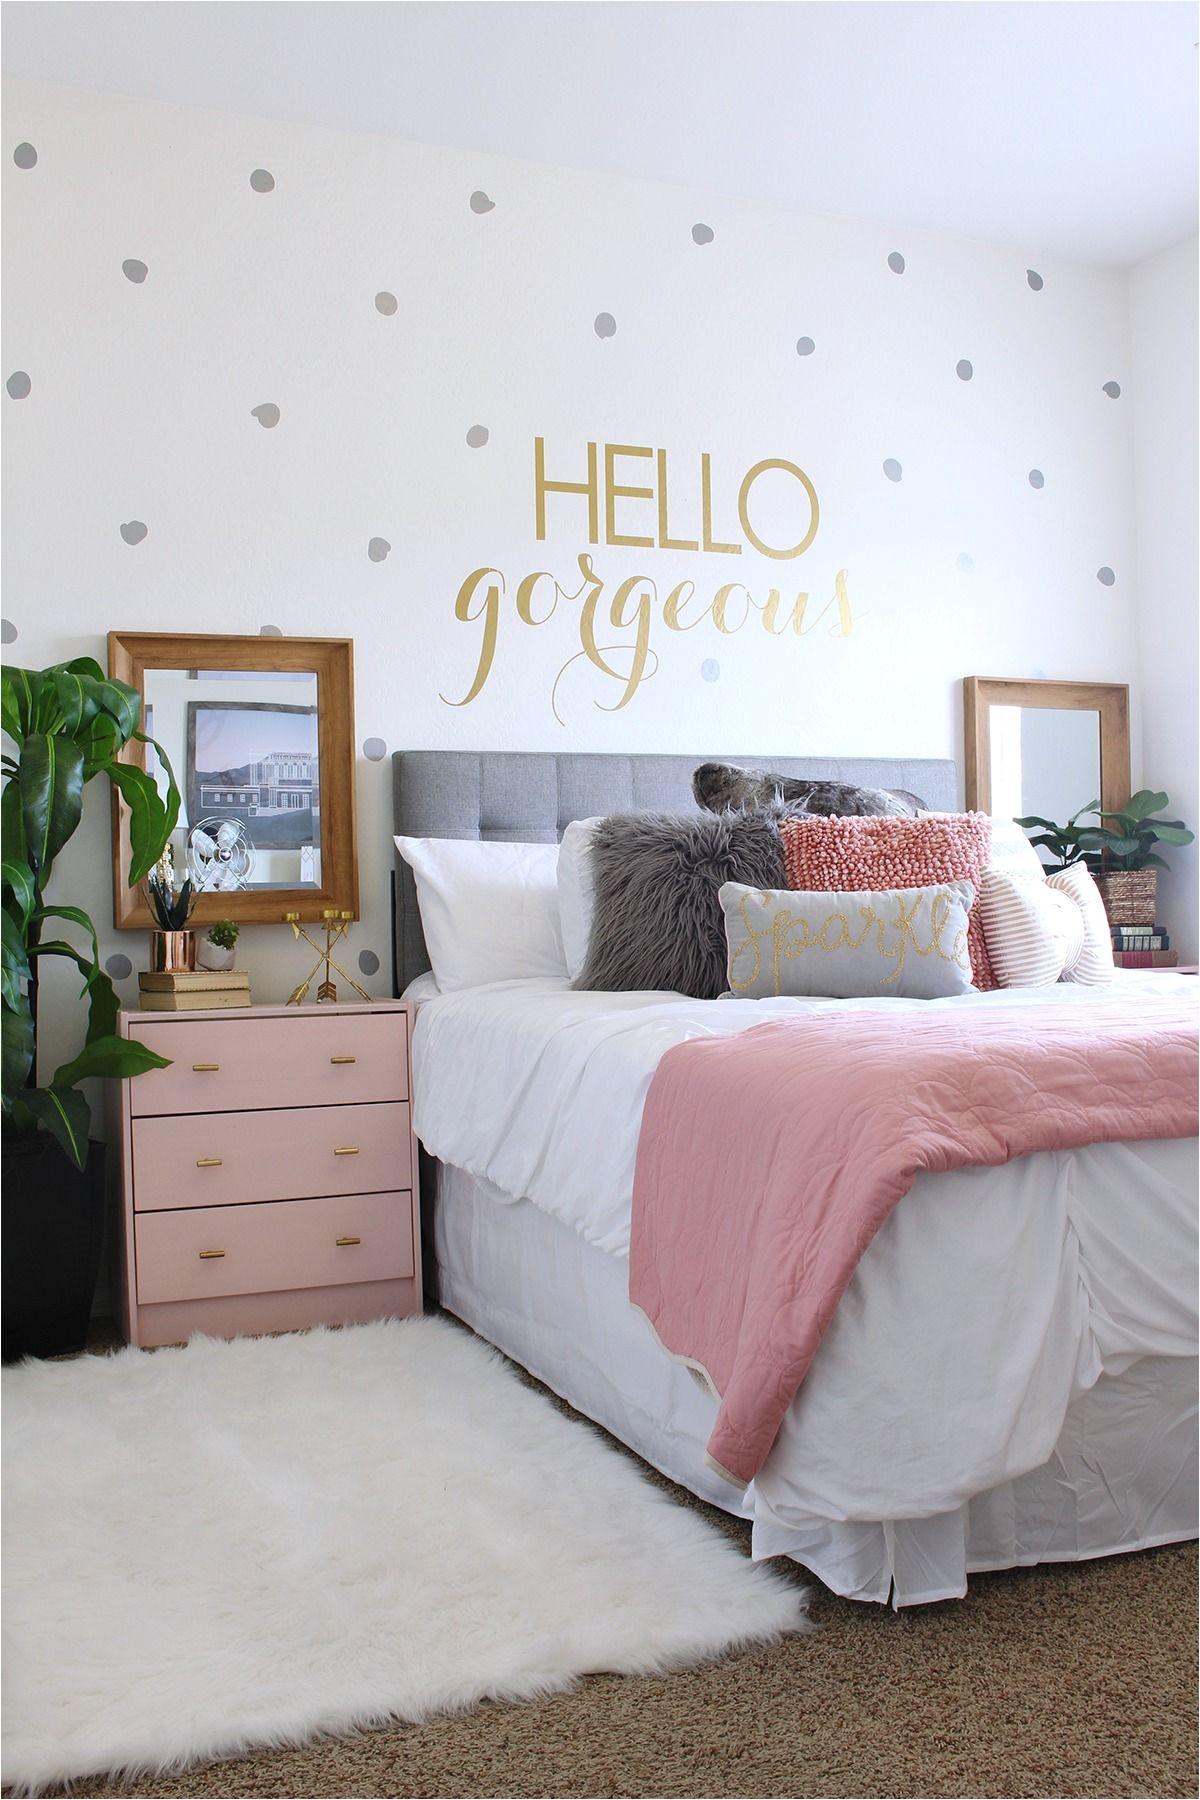 Teen Room Makeover ideas